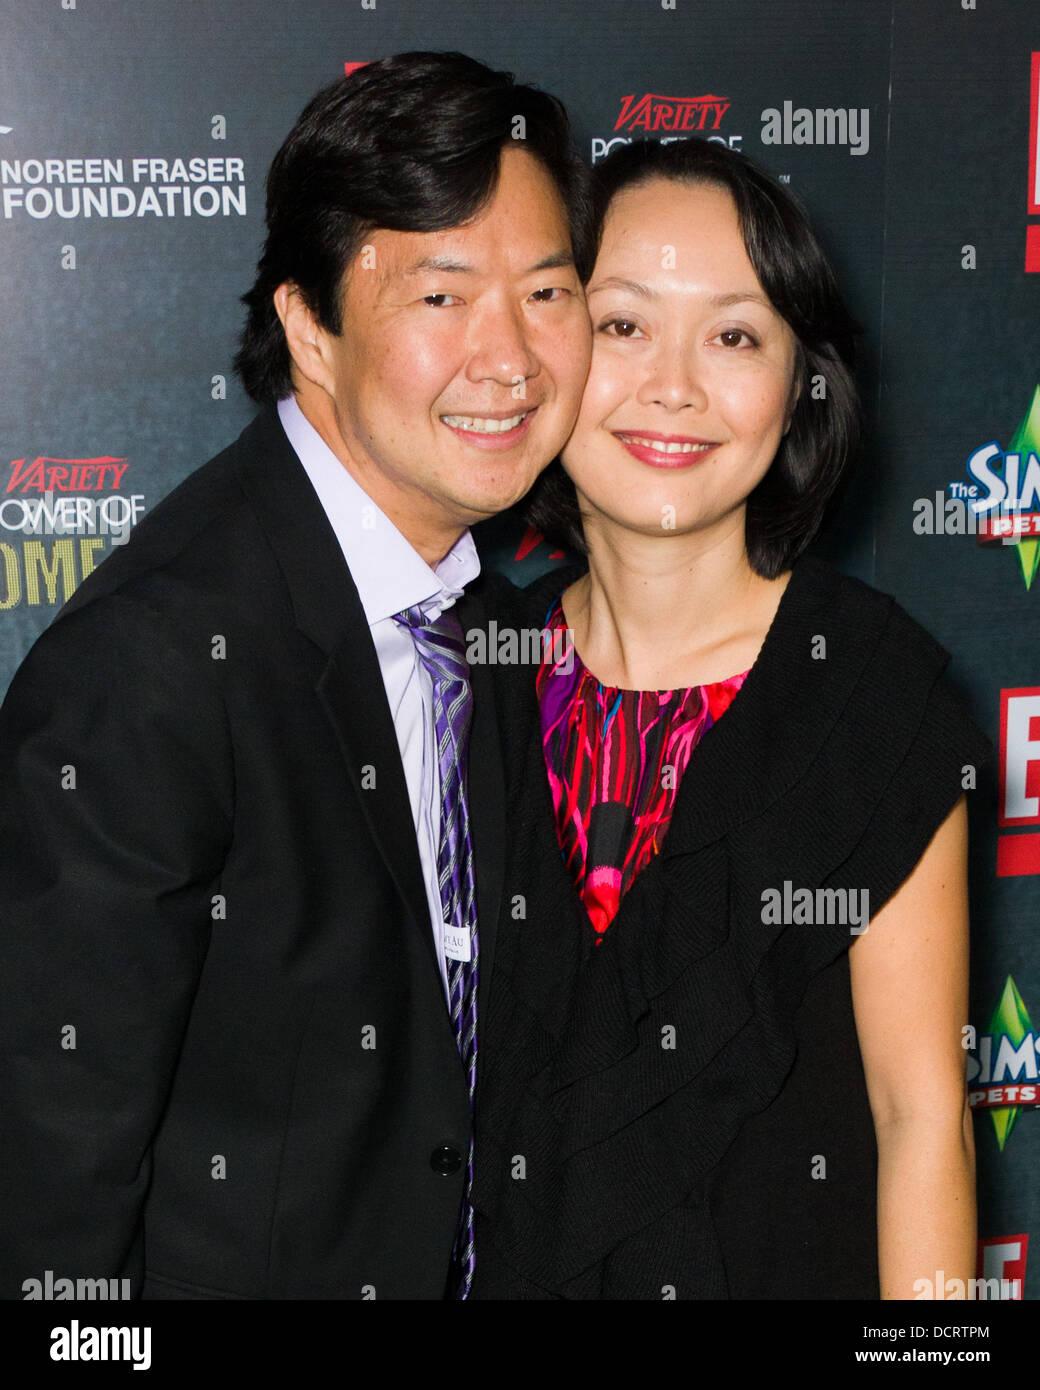 Ken Jeong And Tran Ho Stock Photo 59531324 Alamy